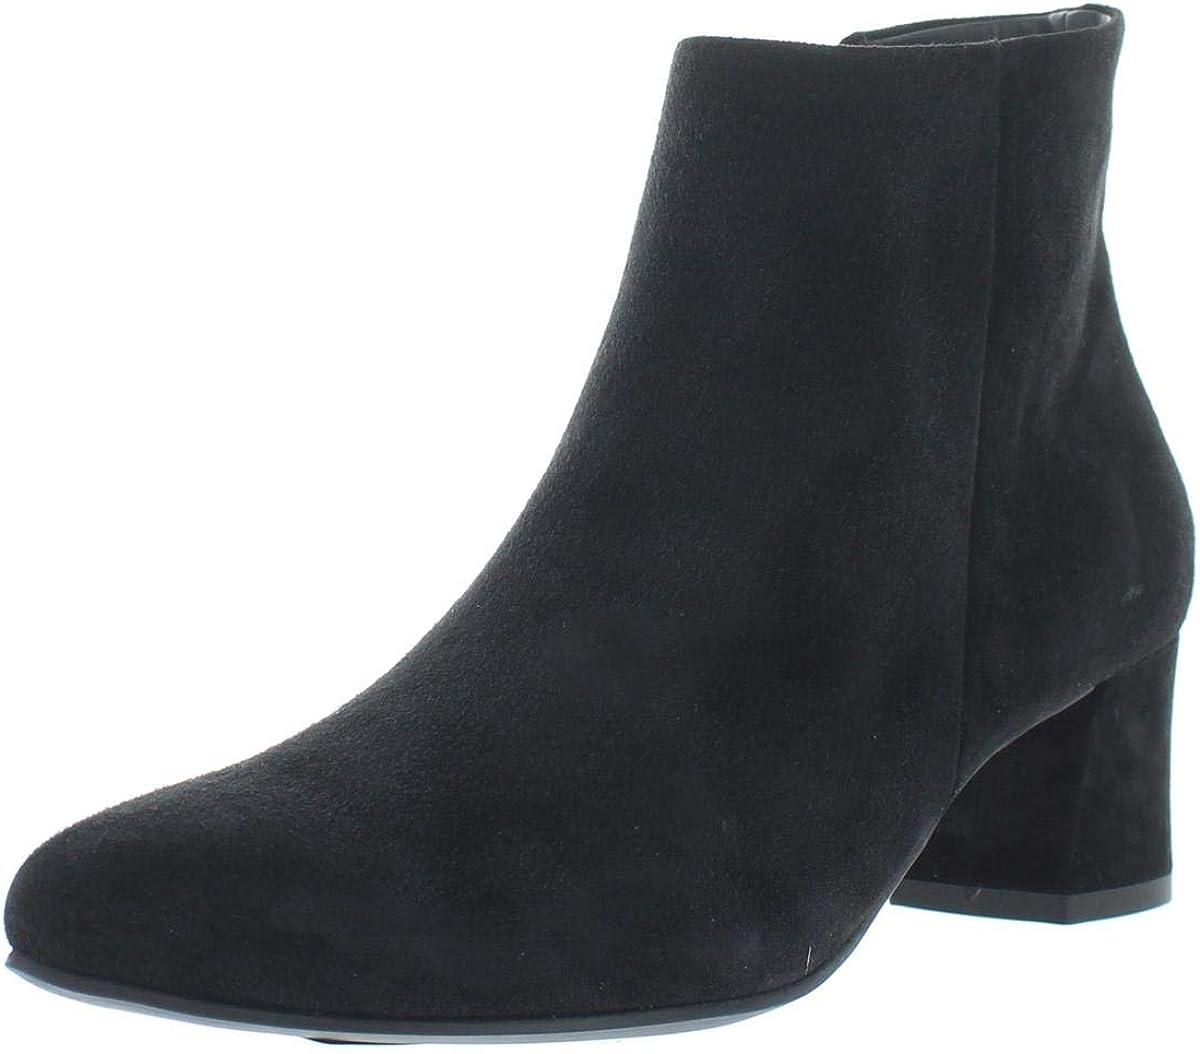 Stai attento schiudere cavità  Amazon.com | Paul Green Womens Bridget Suede Pointed Toe Ankle Boots Black  8.5 Medium (B, M) | Shoes